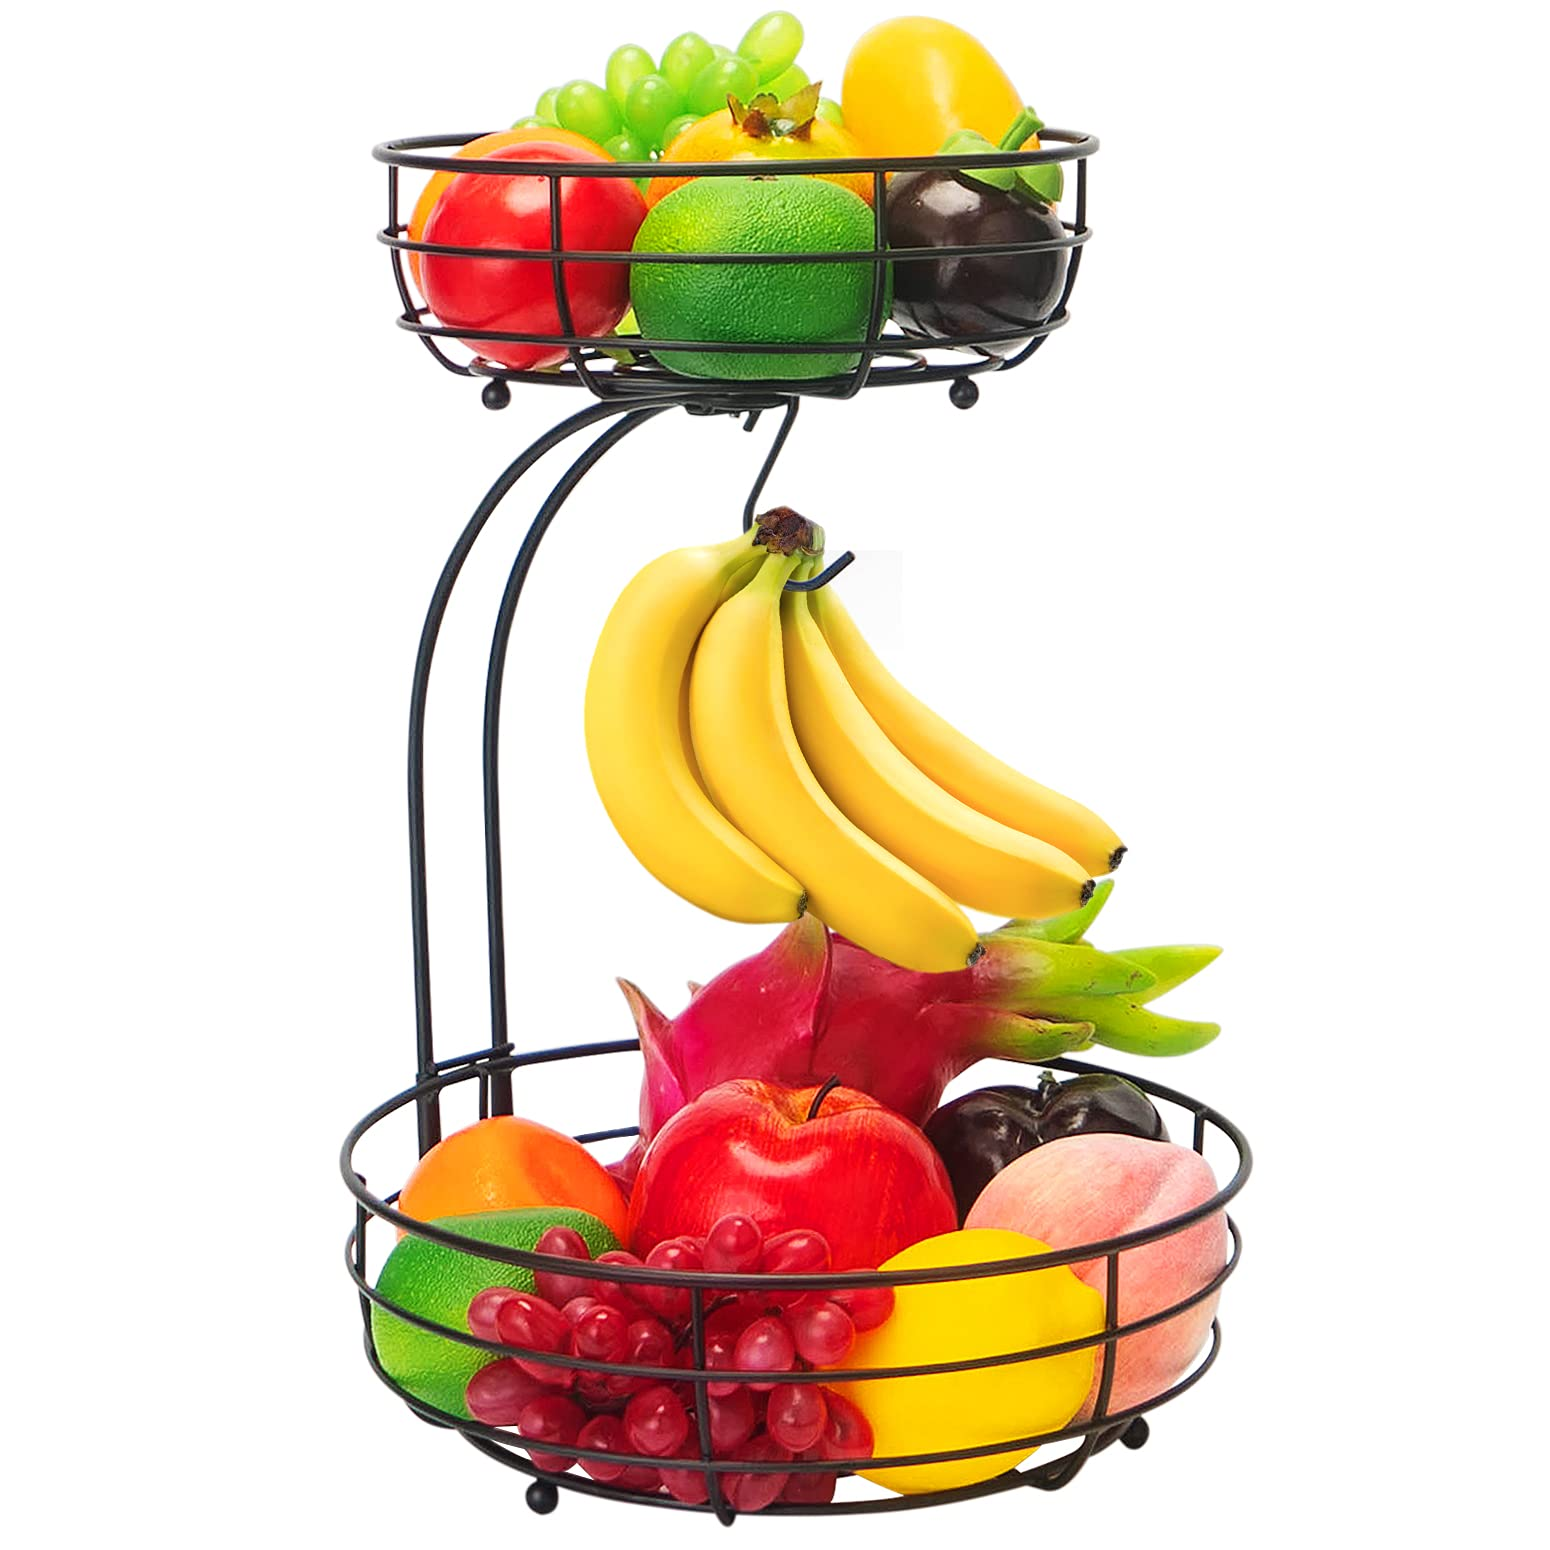 Bextsrack 2-Tier Countertop Fruit Basket Bowl with Banana Hanger for Kitchen Dining